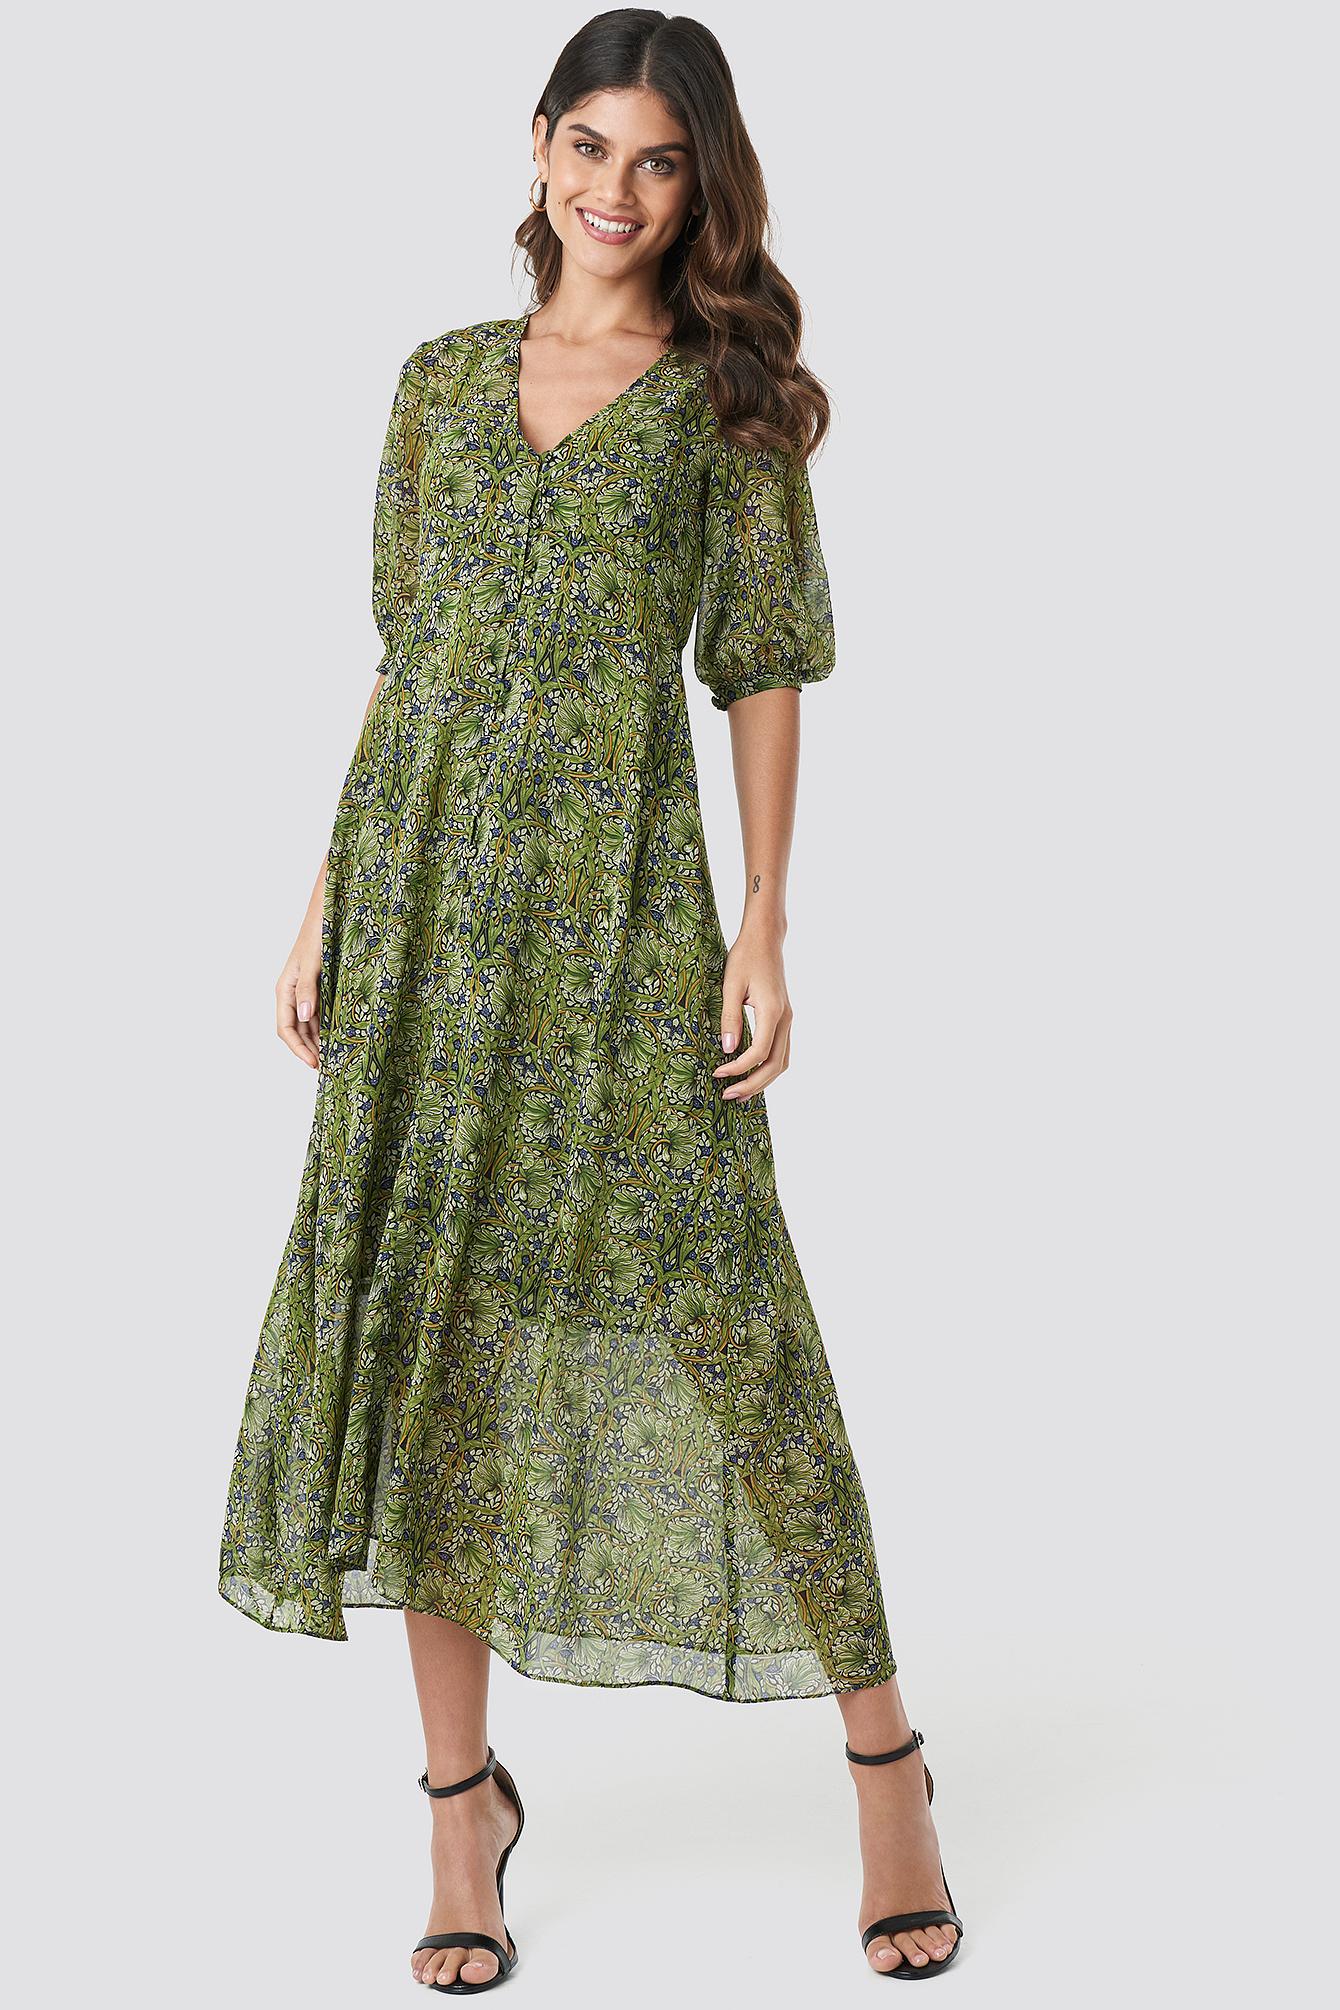 Leonie Dress NA-KD.COM